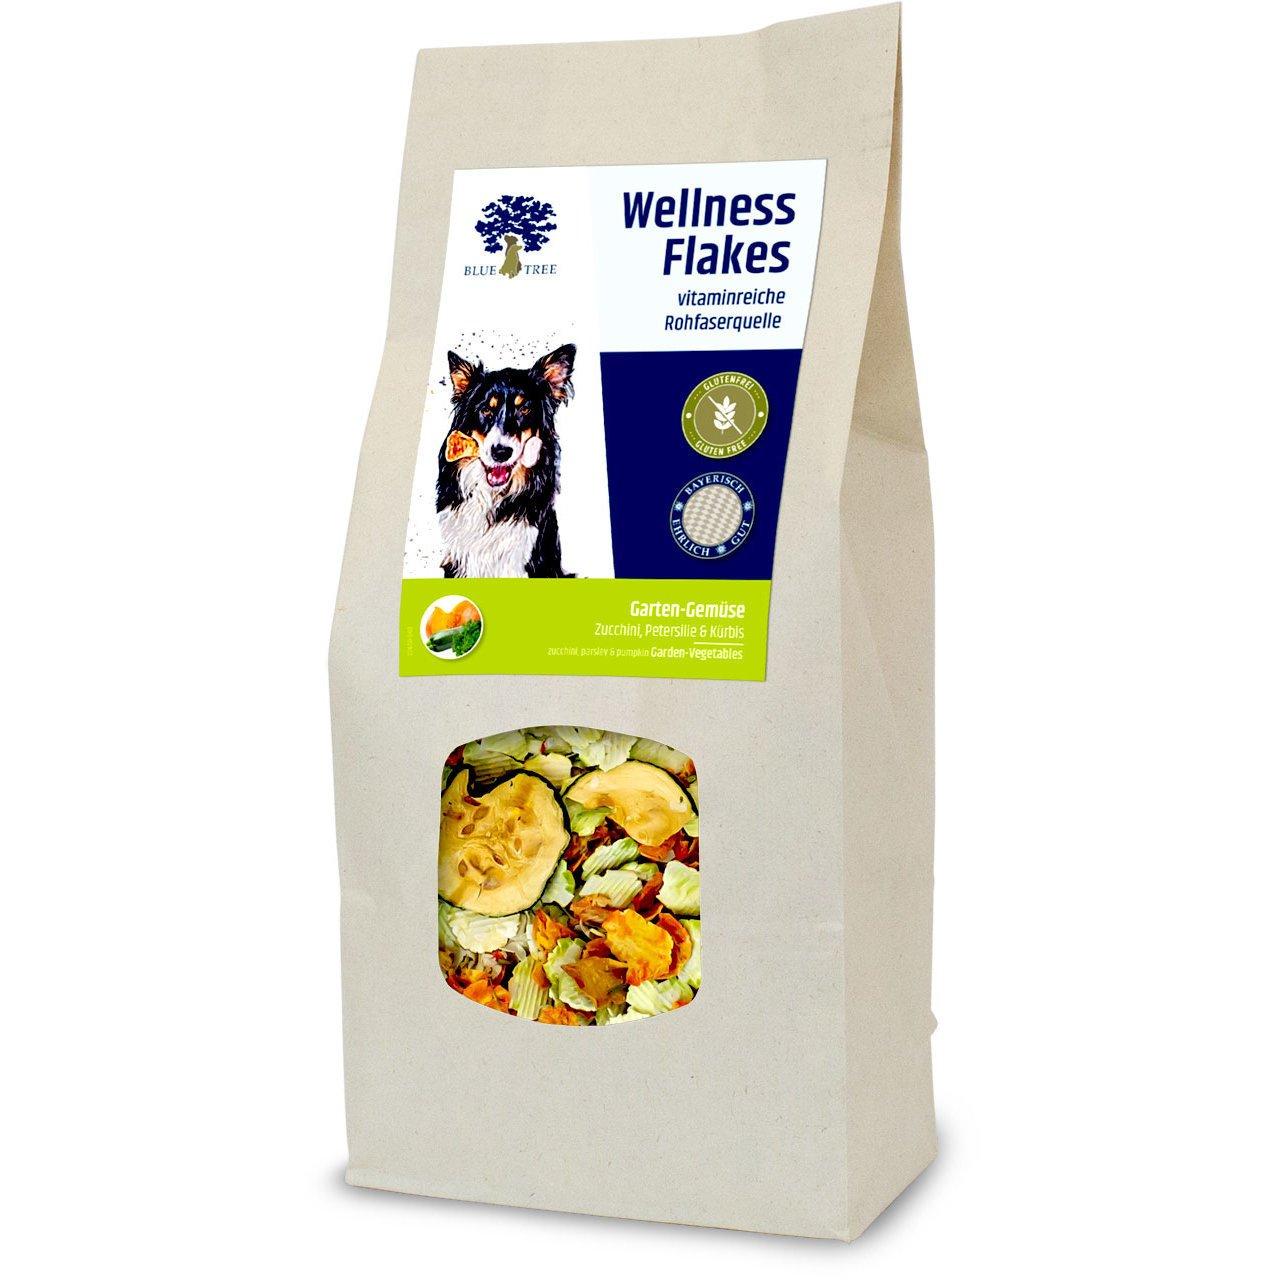 Blue Tree Wellness Flakes für Hunde, Bild 8